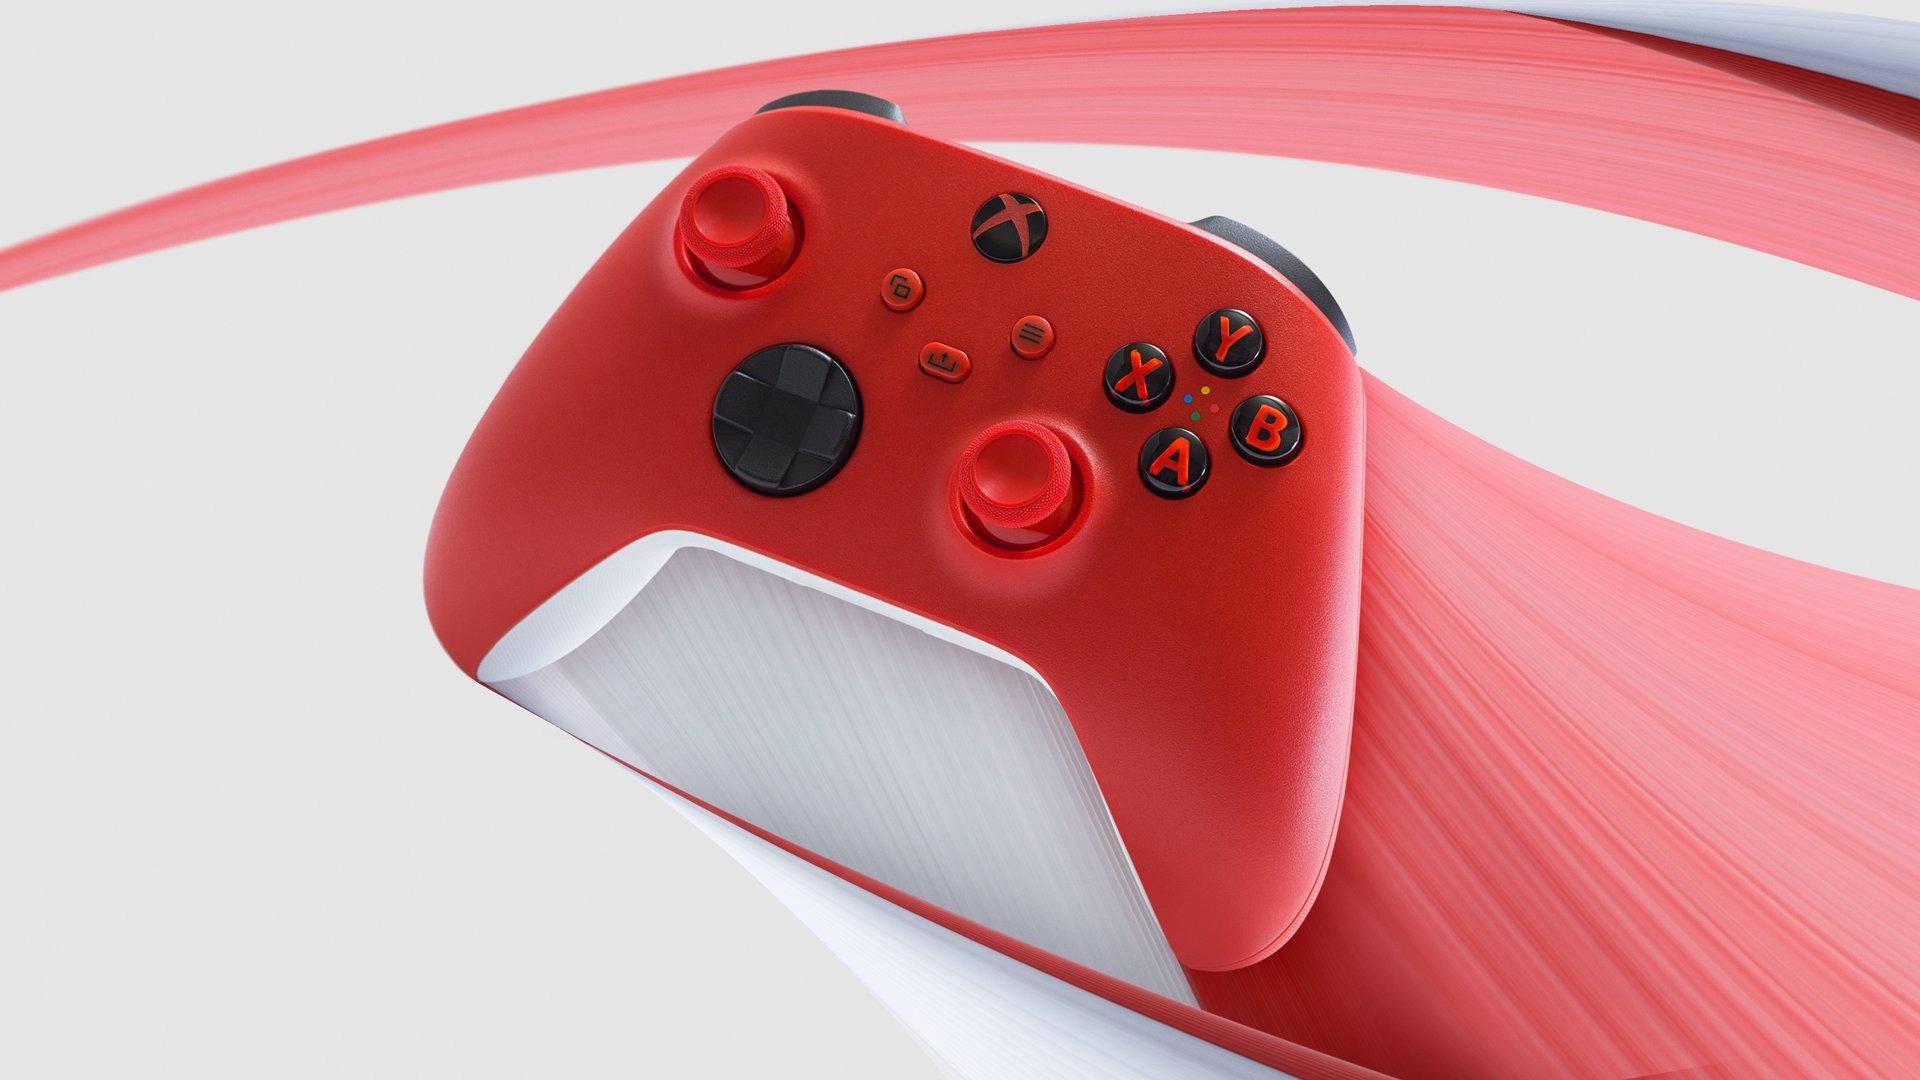 Microsoft анонсировала новый геймпад Xbox в расцветке Pulse Red